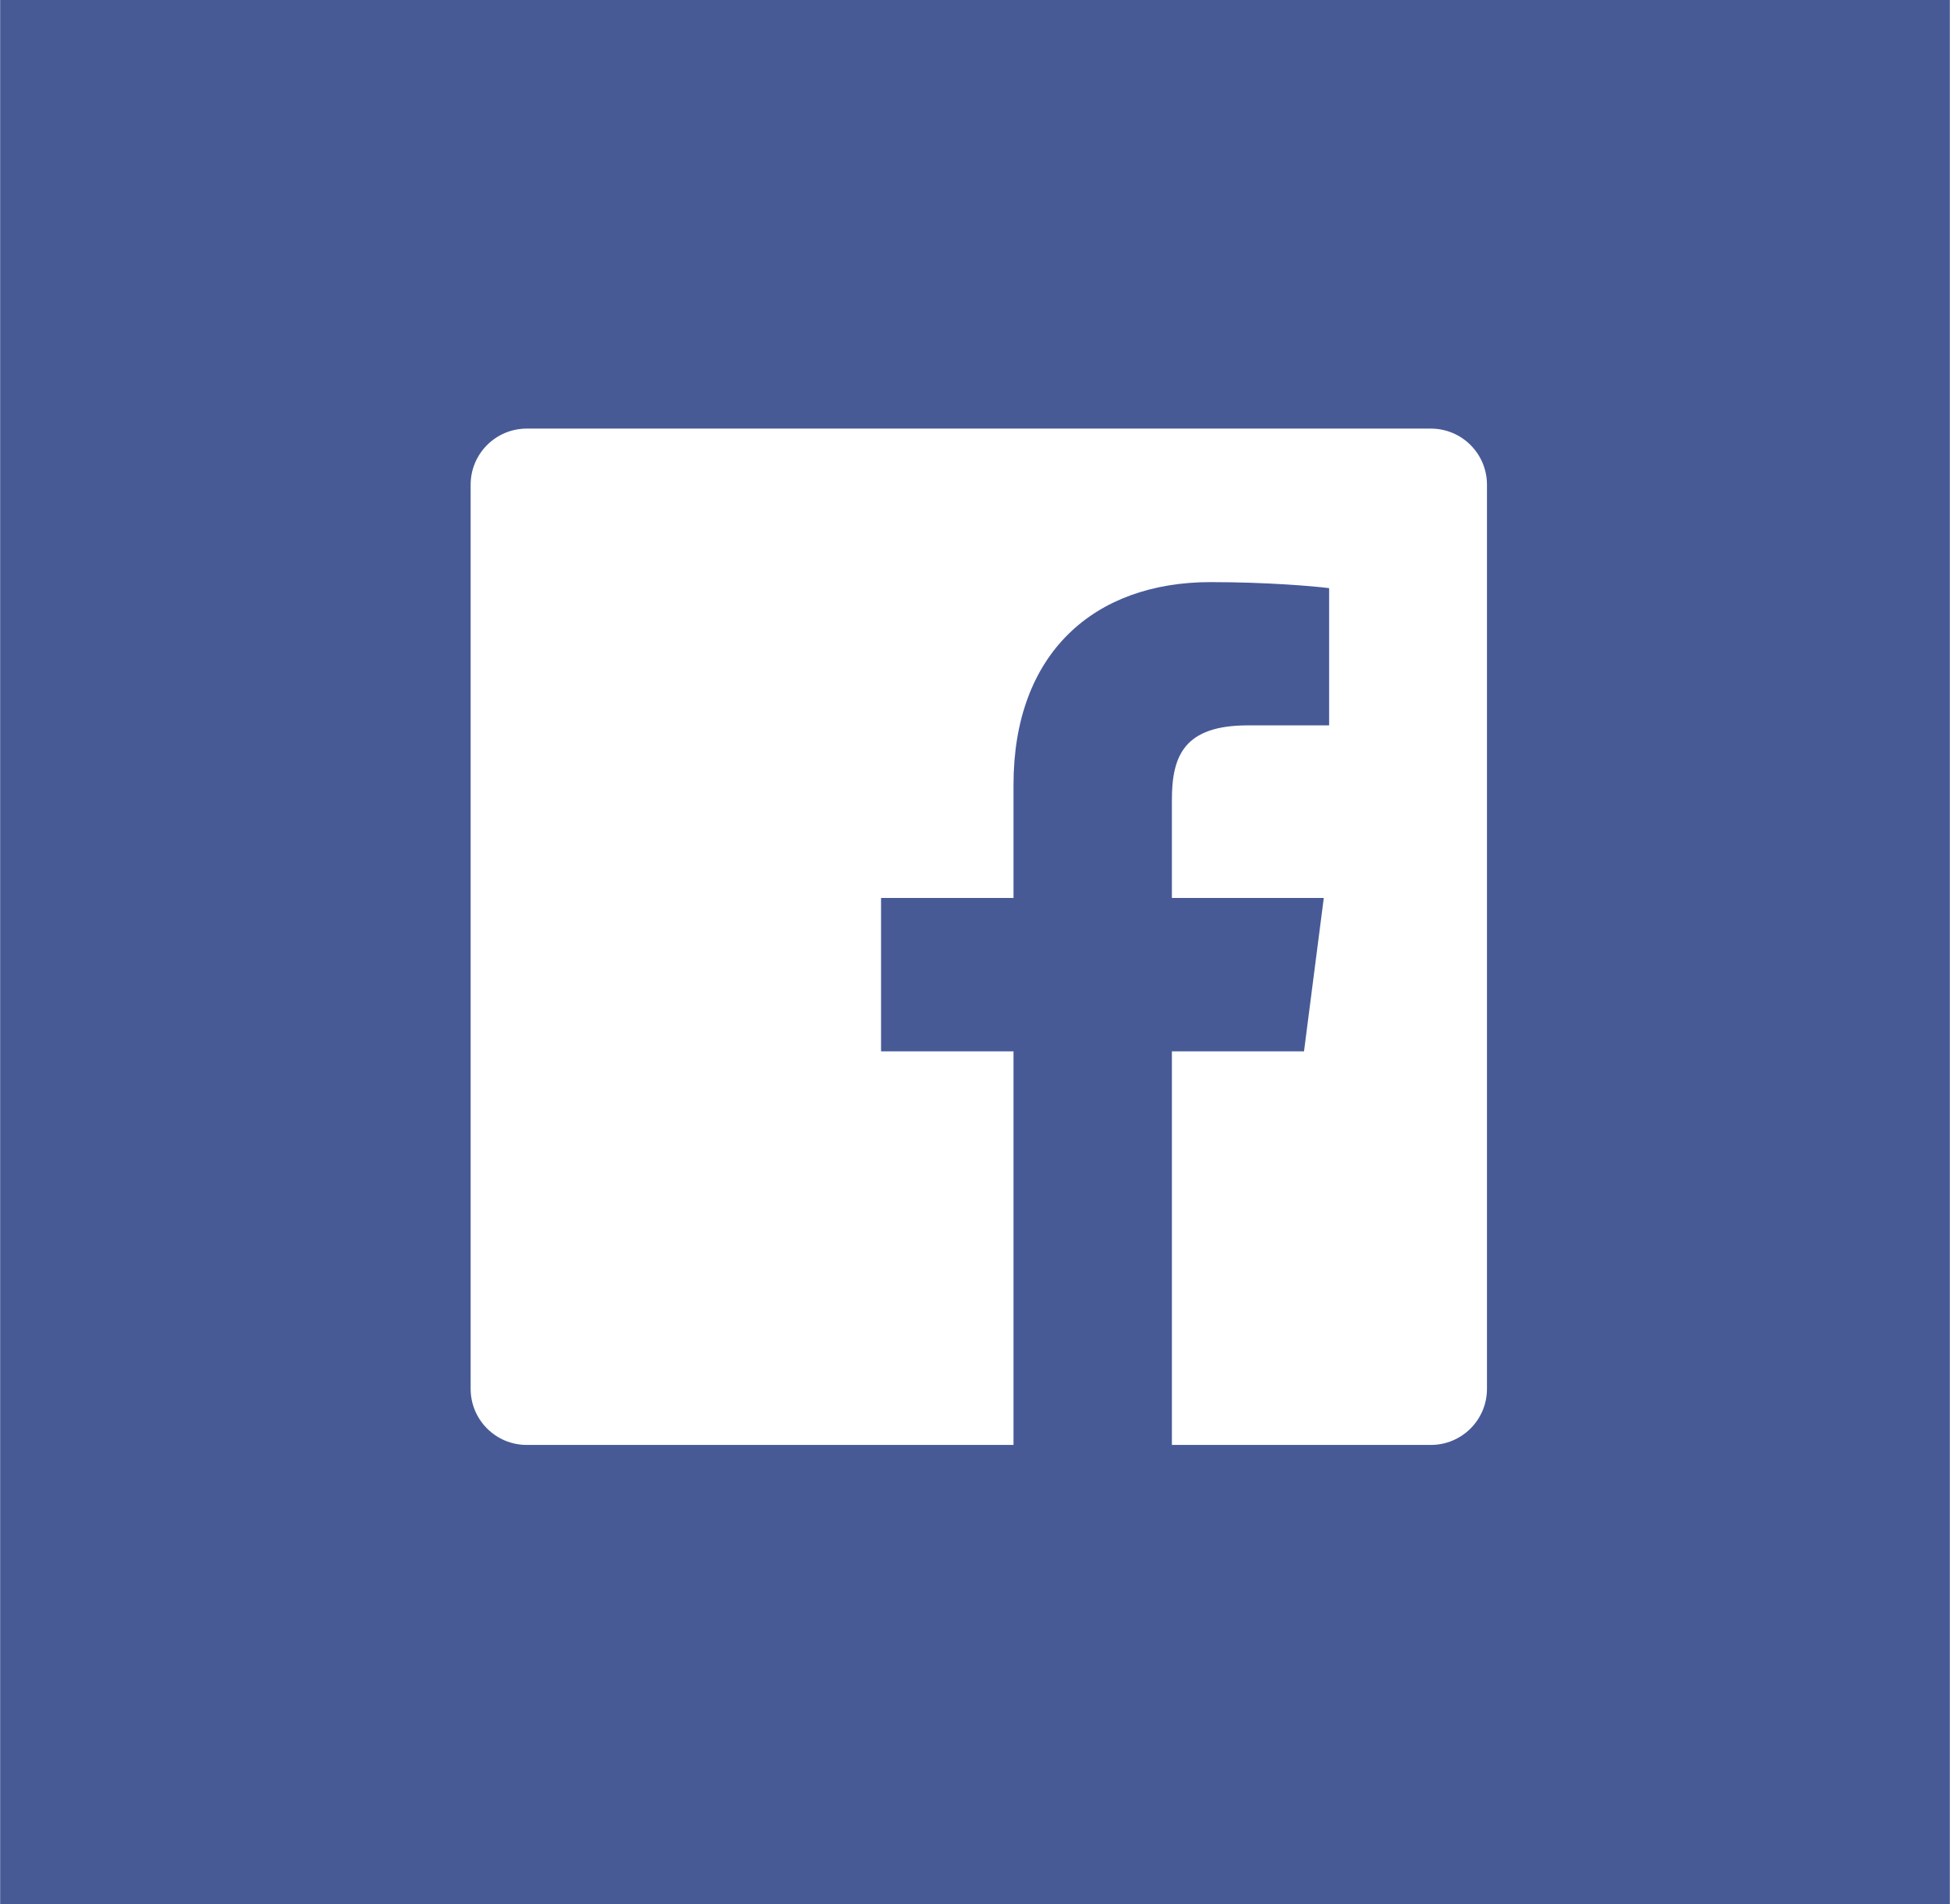 Facebook icon white Logo PNG Transparent & SVG Vector.